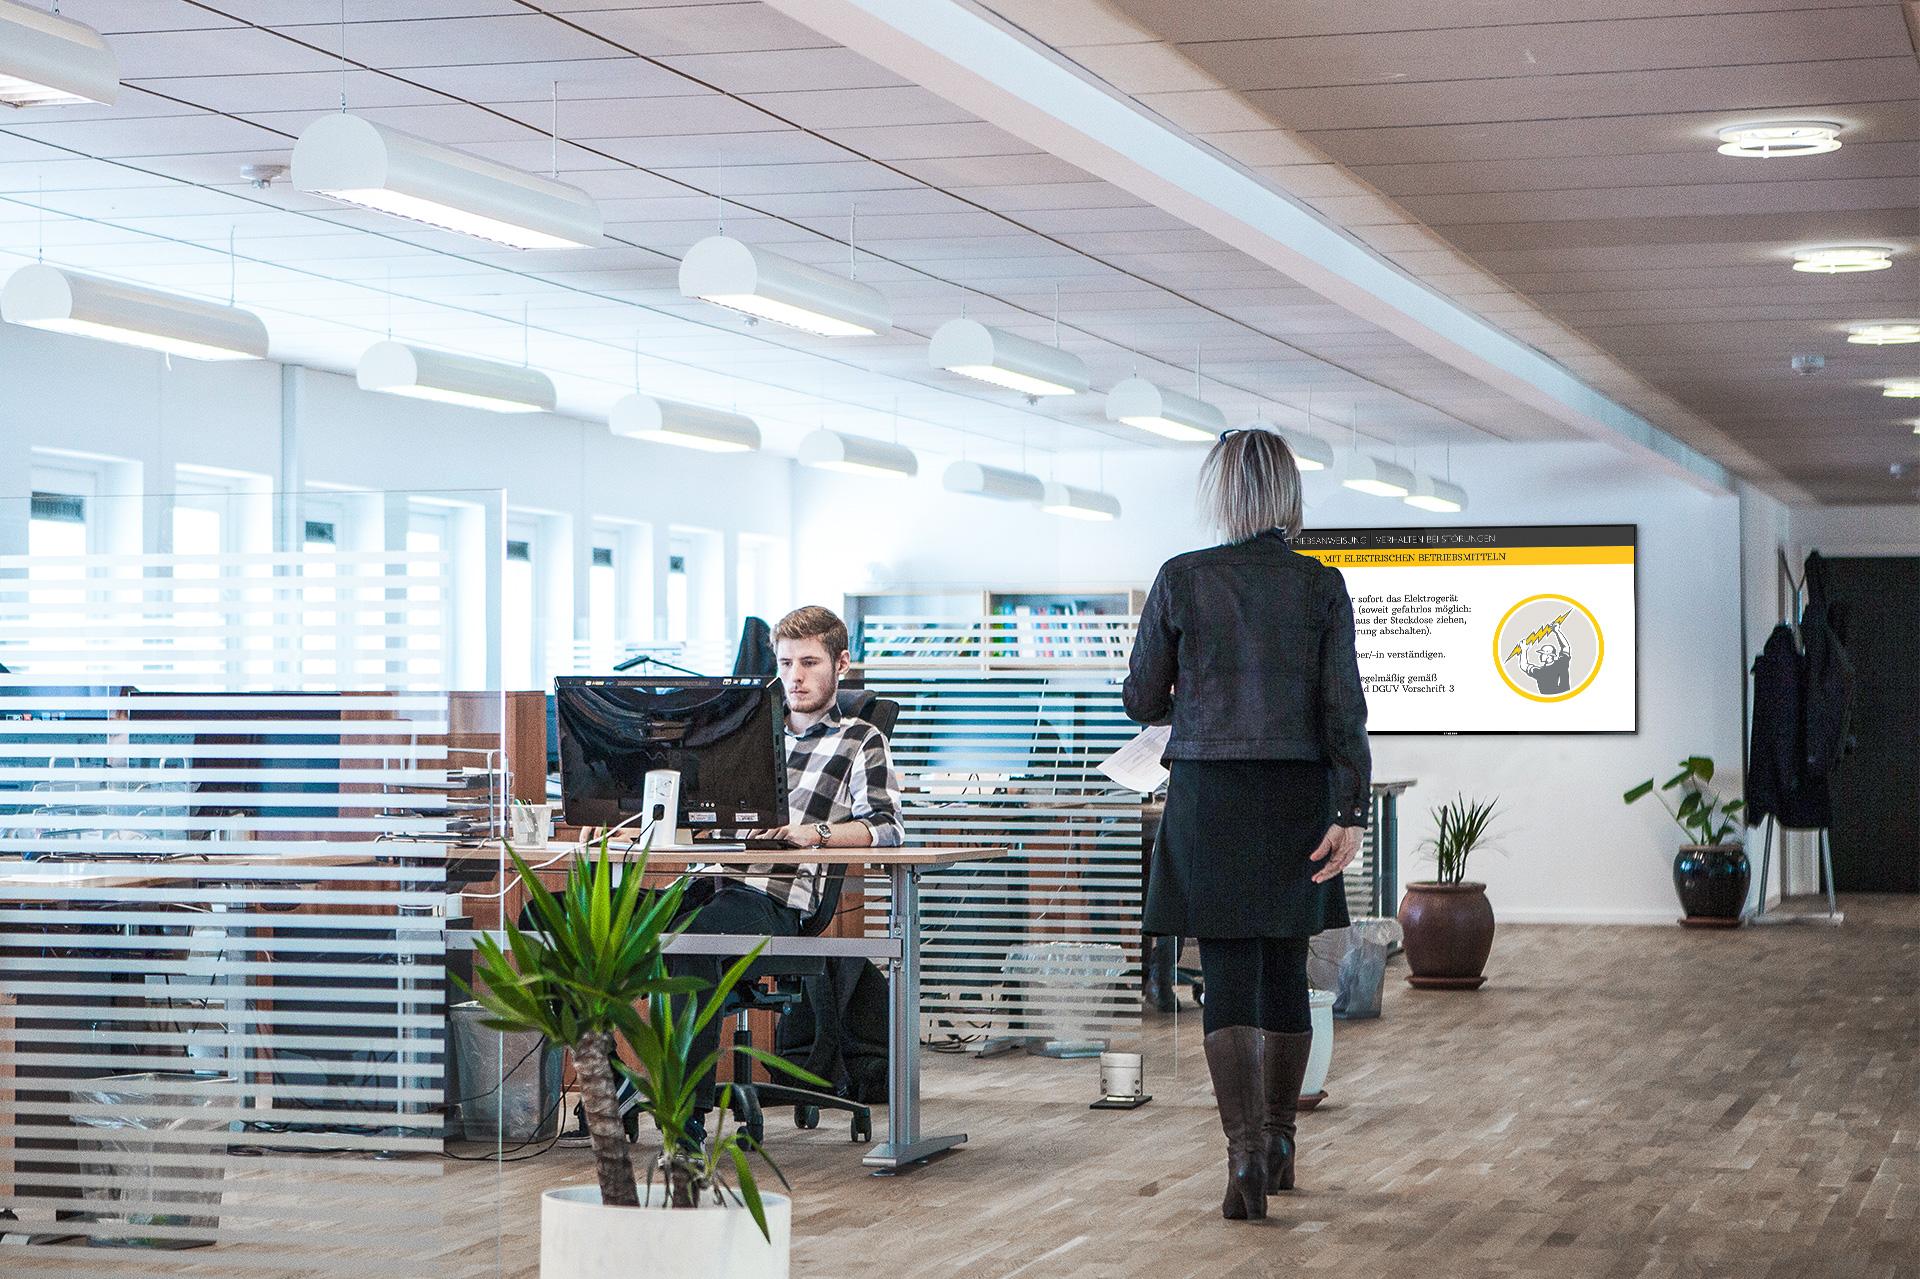 WESUAL interne Kommunikation - digitales schwarzes Brett im Office - digital Blackboard